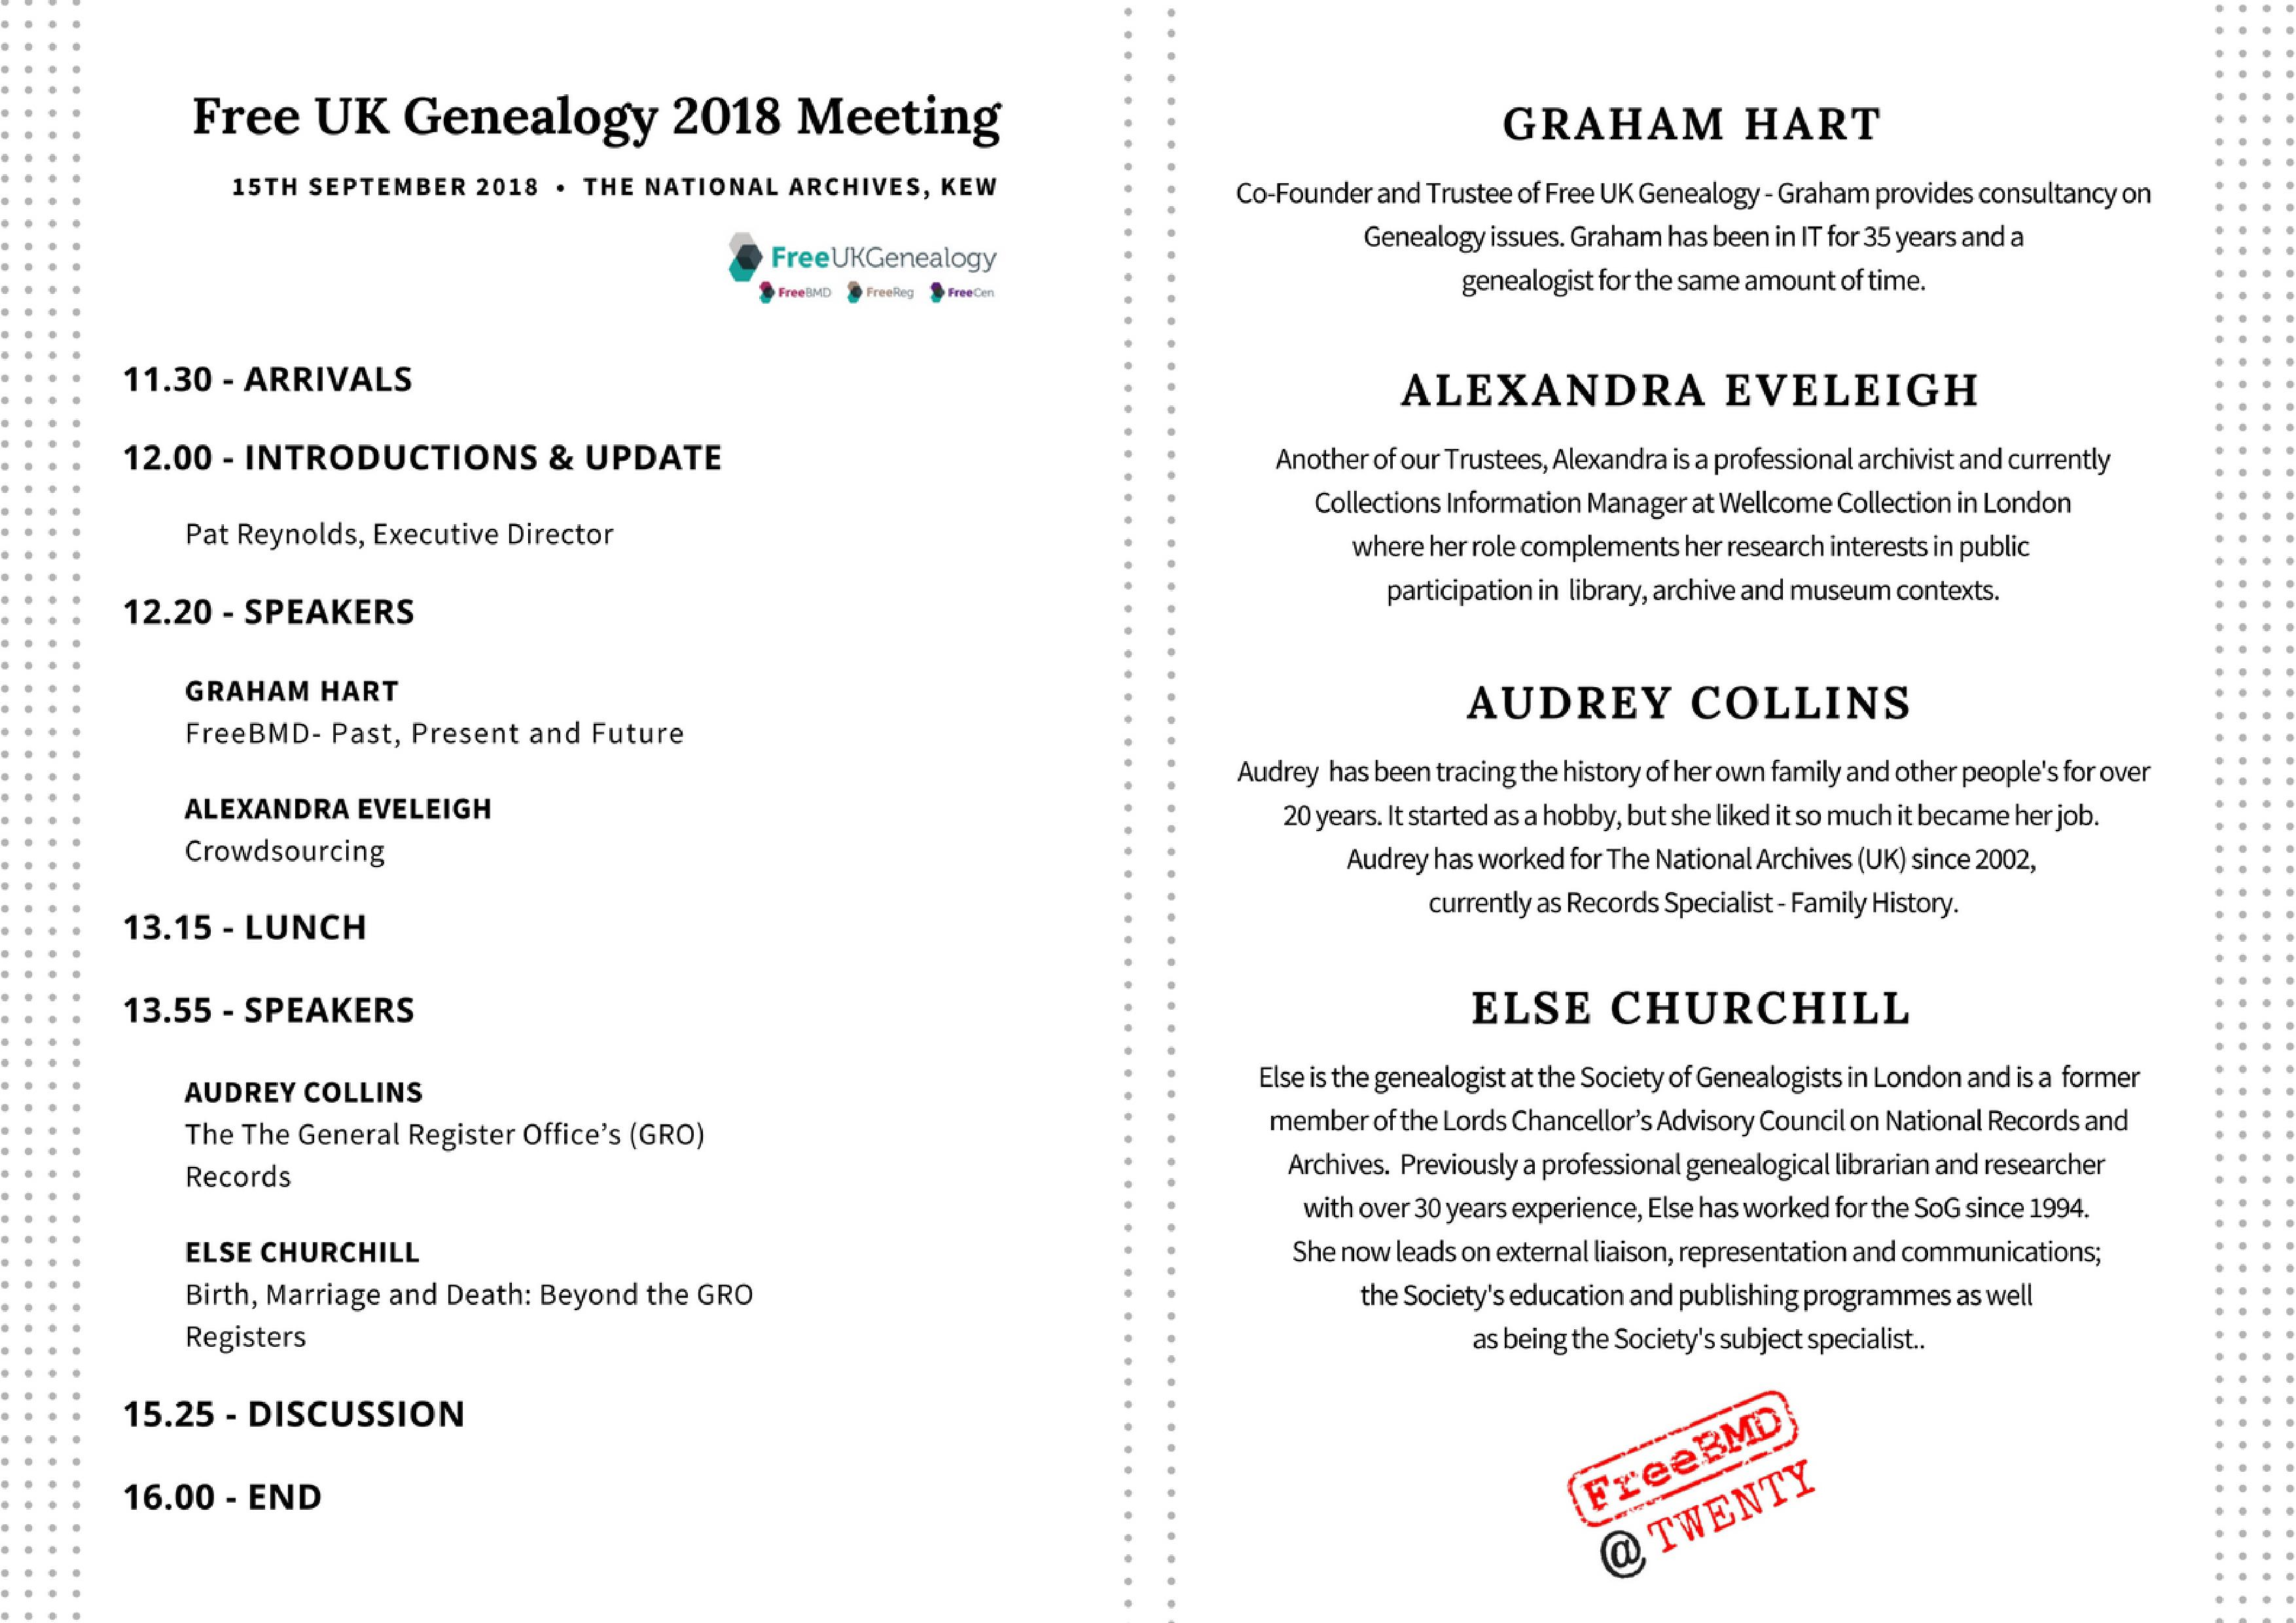 Program and speakers